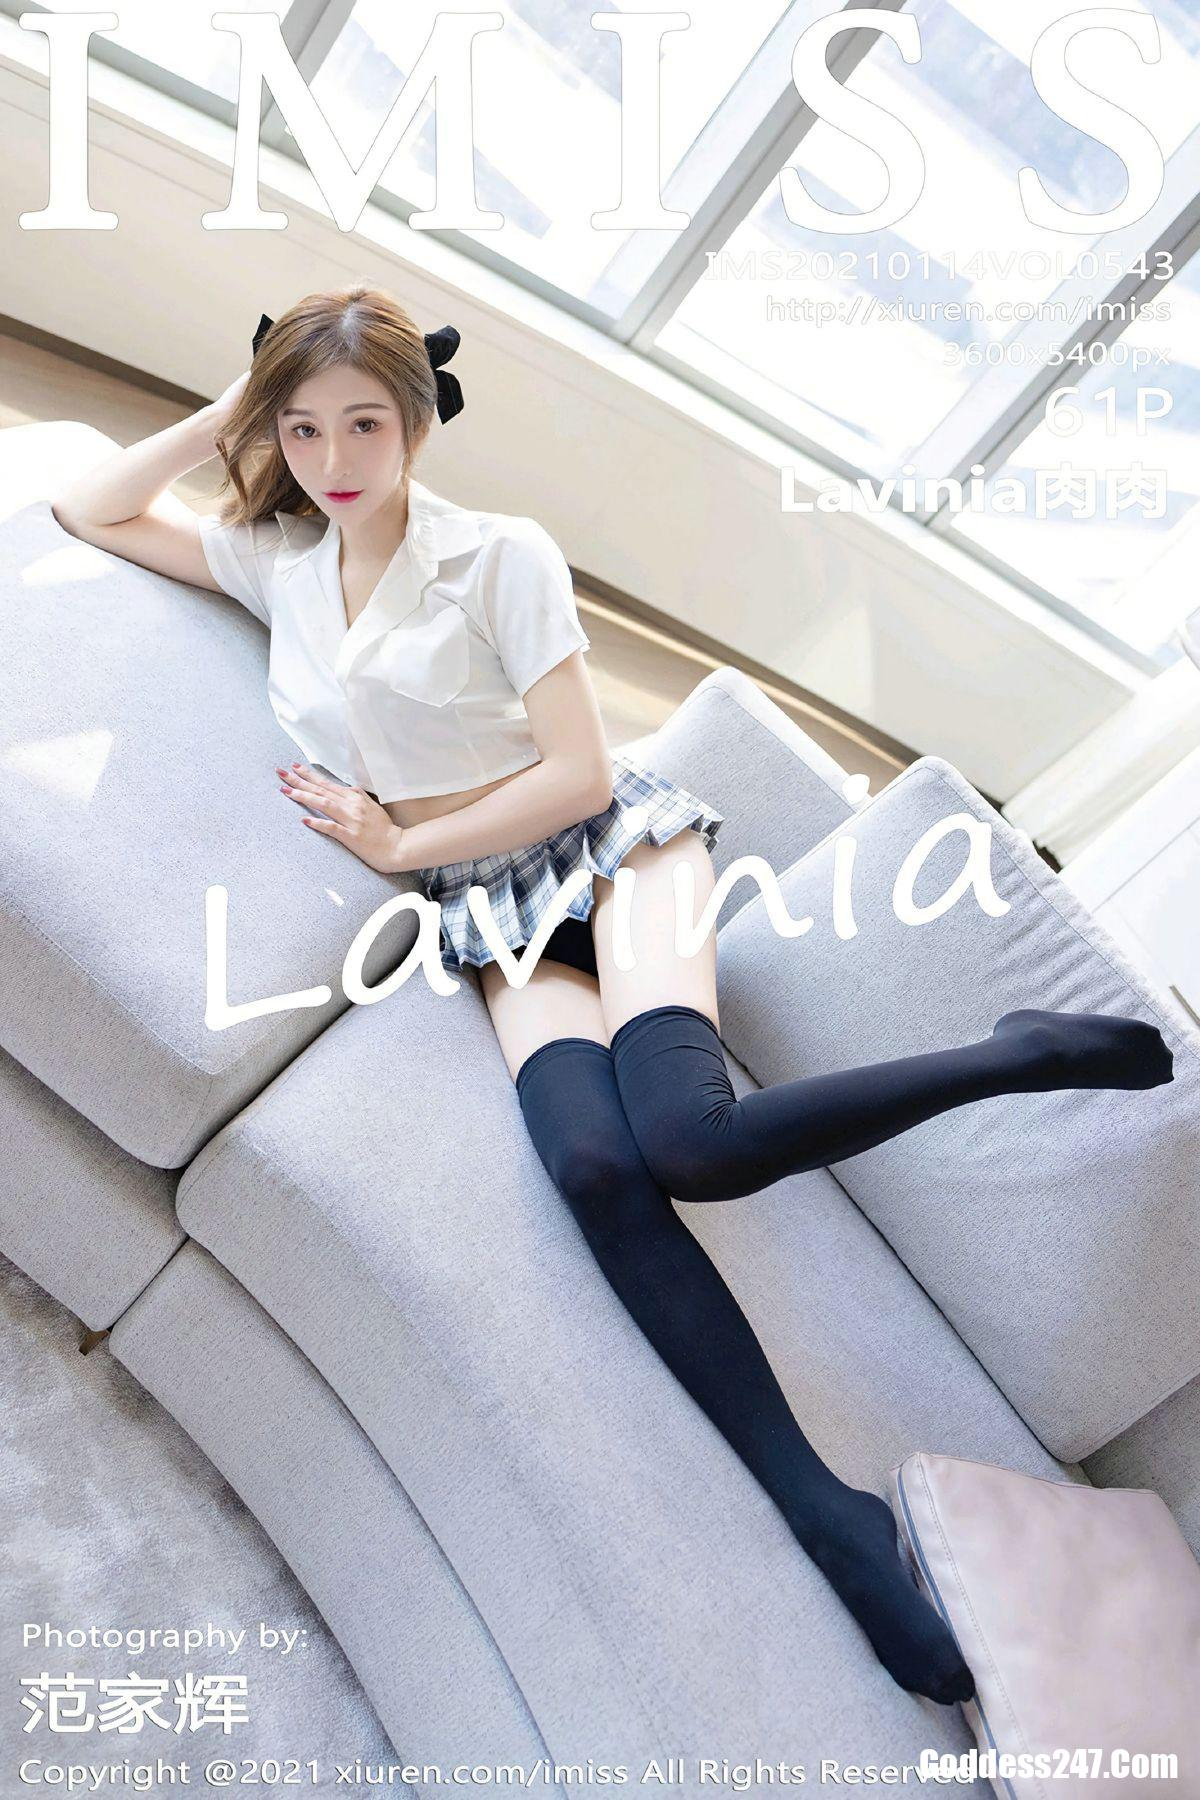 IMiss爱蜜社 Vol.543 Lavinia肉肉